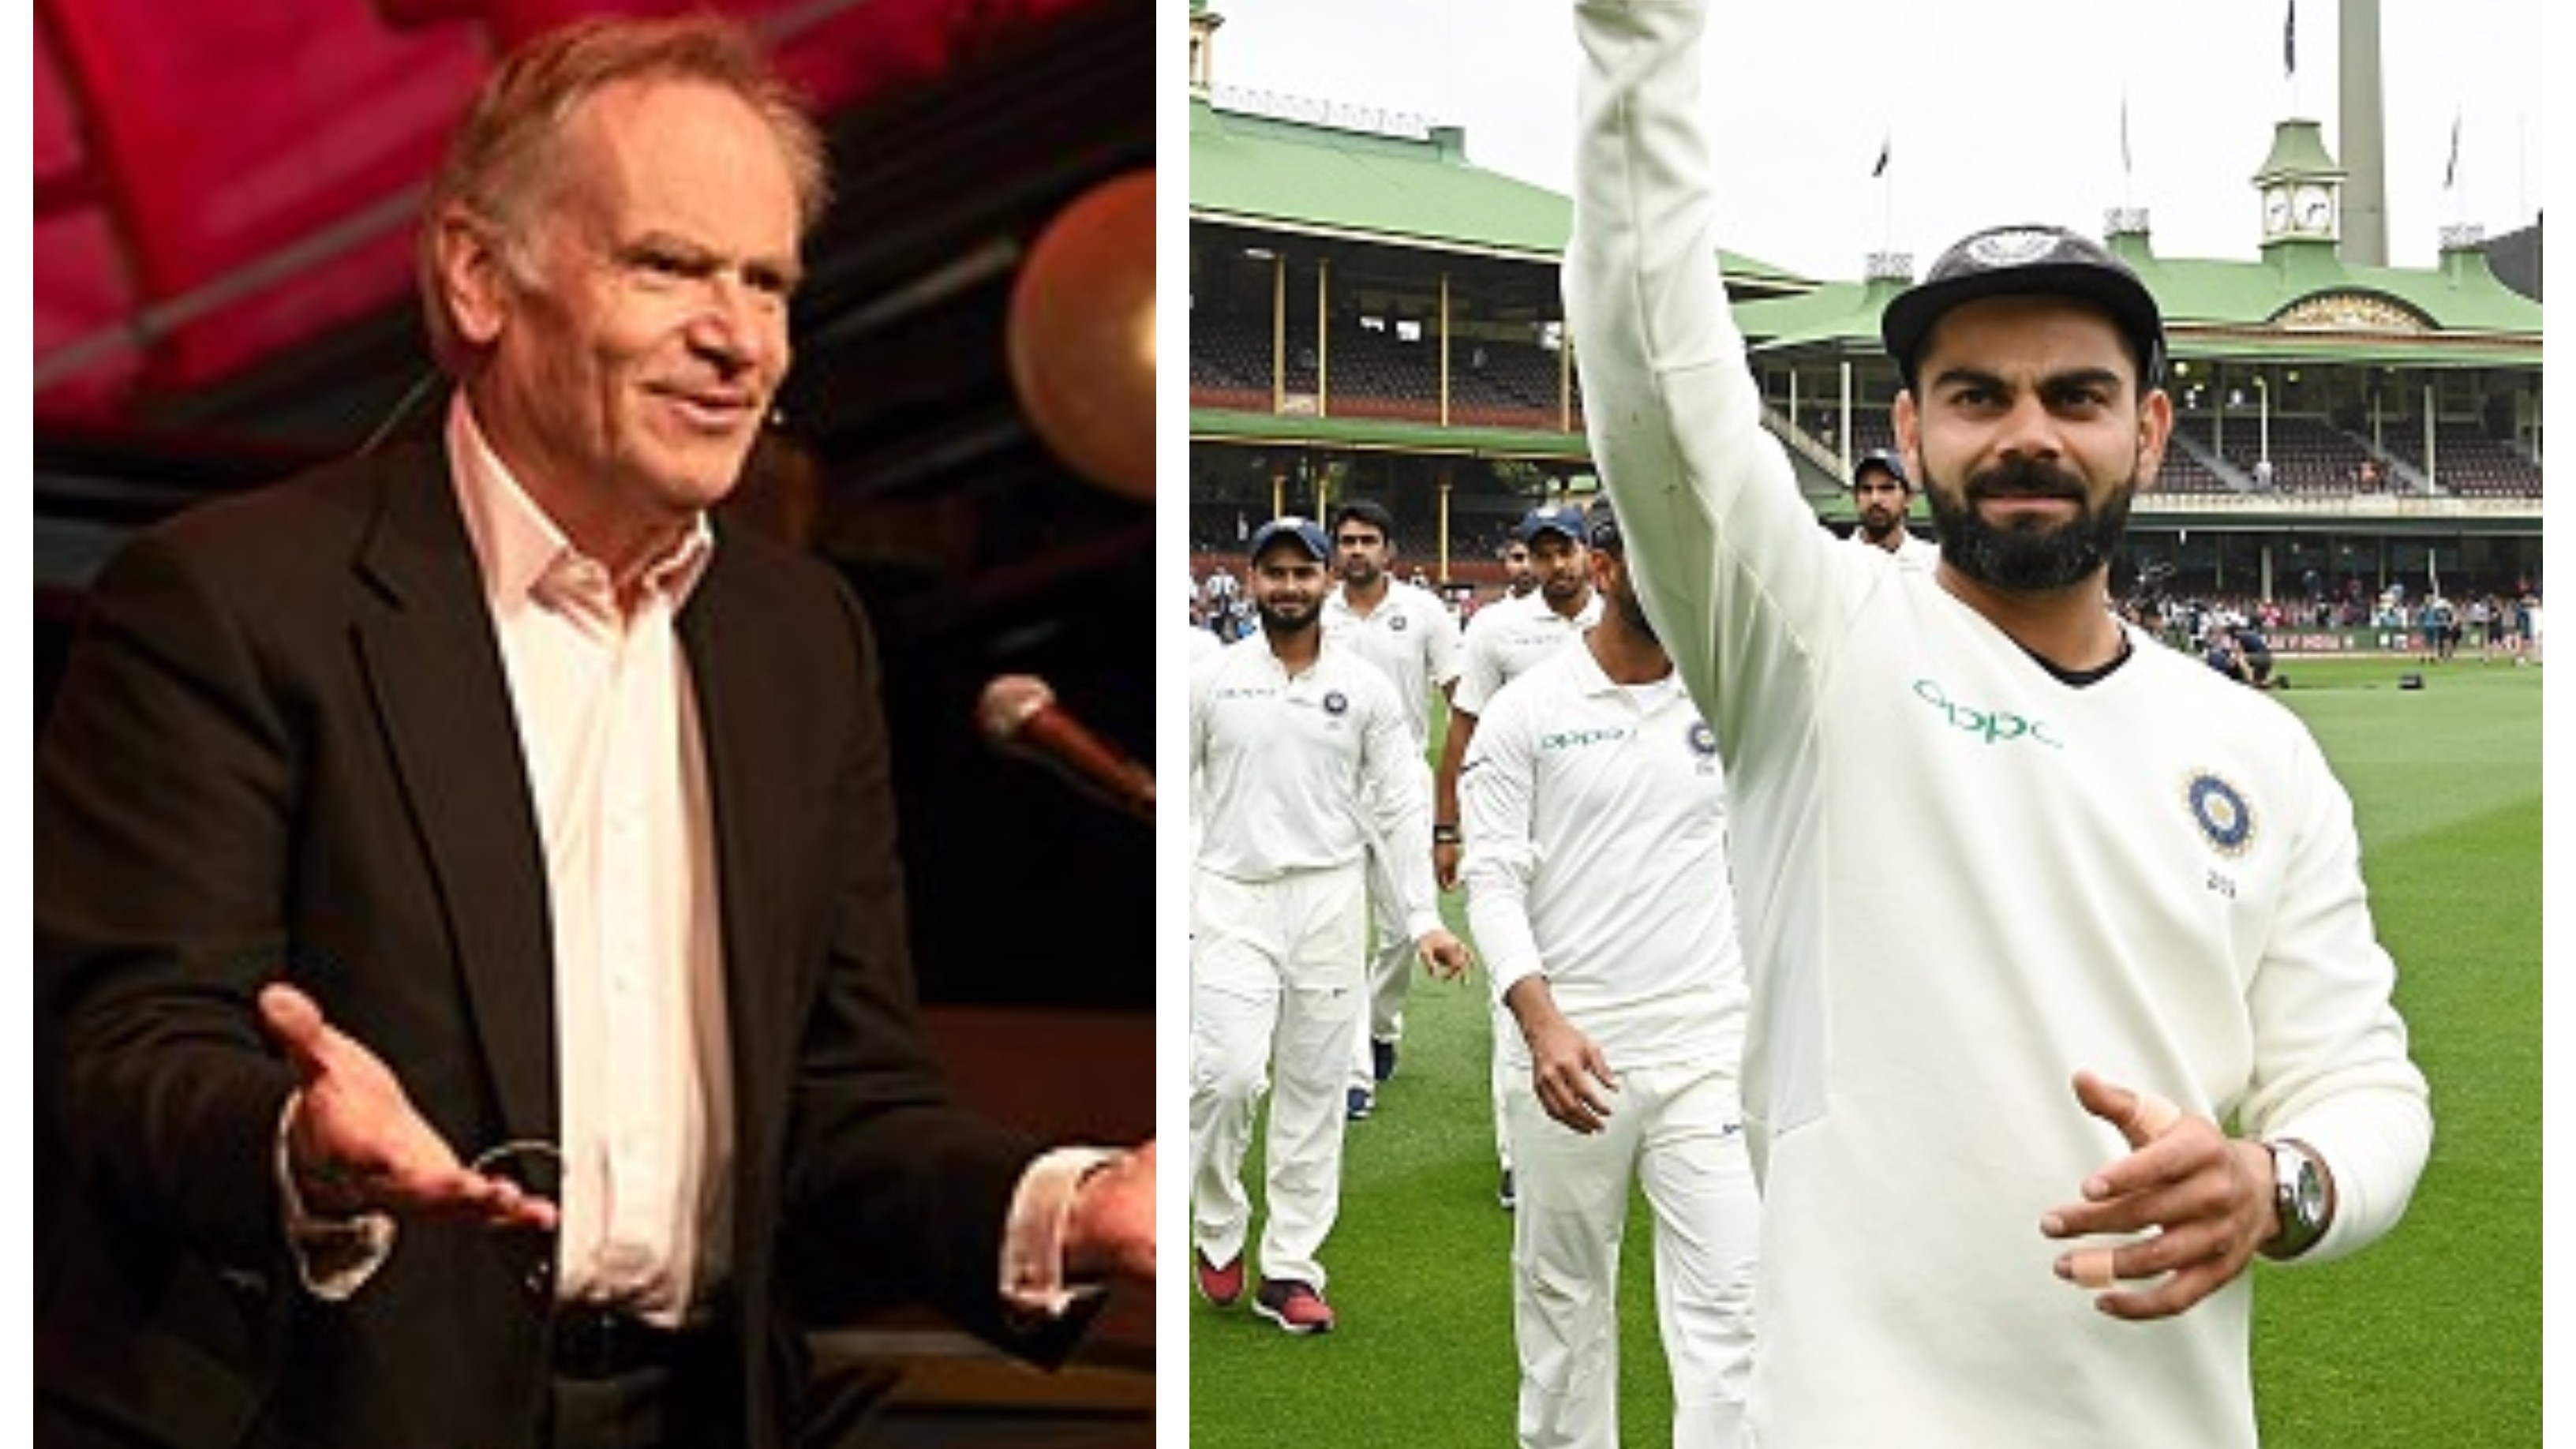 Jeffrey Archer calls himself an admirer of Virat Kohli's competitive attitude